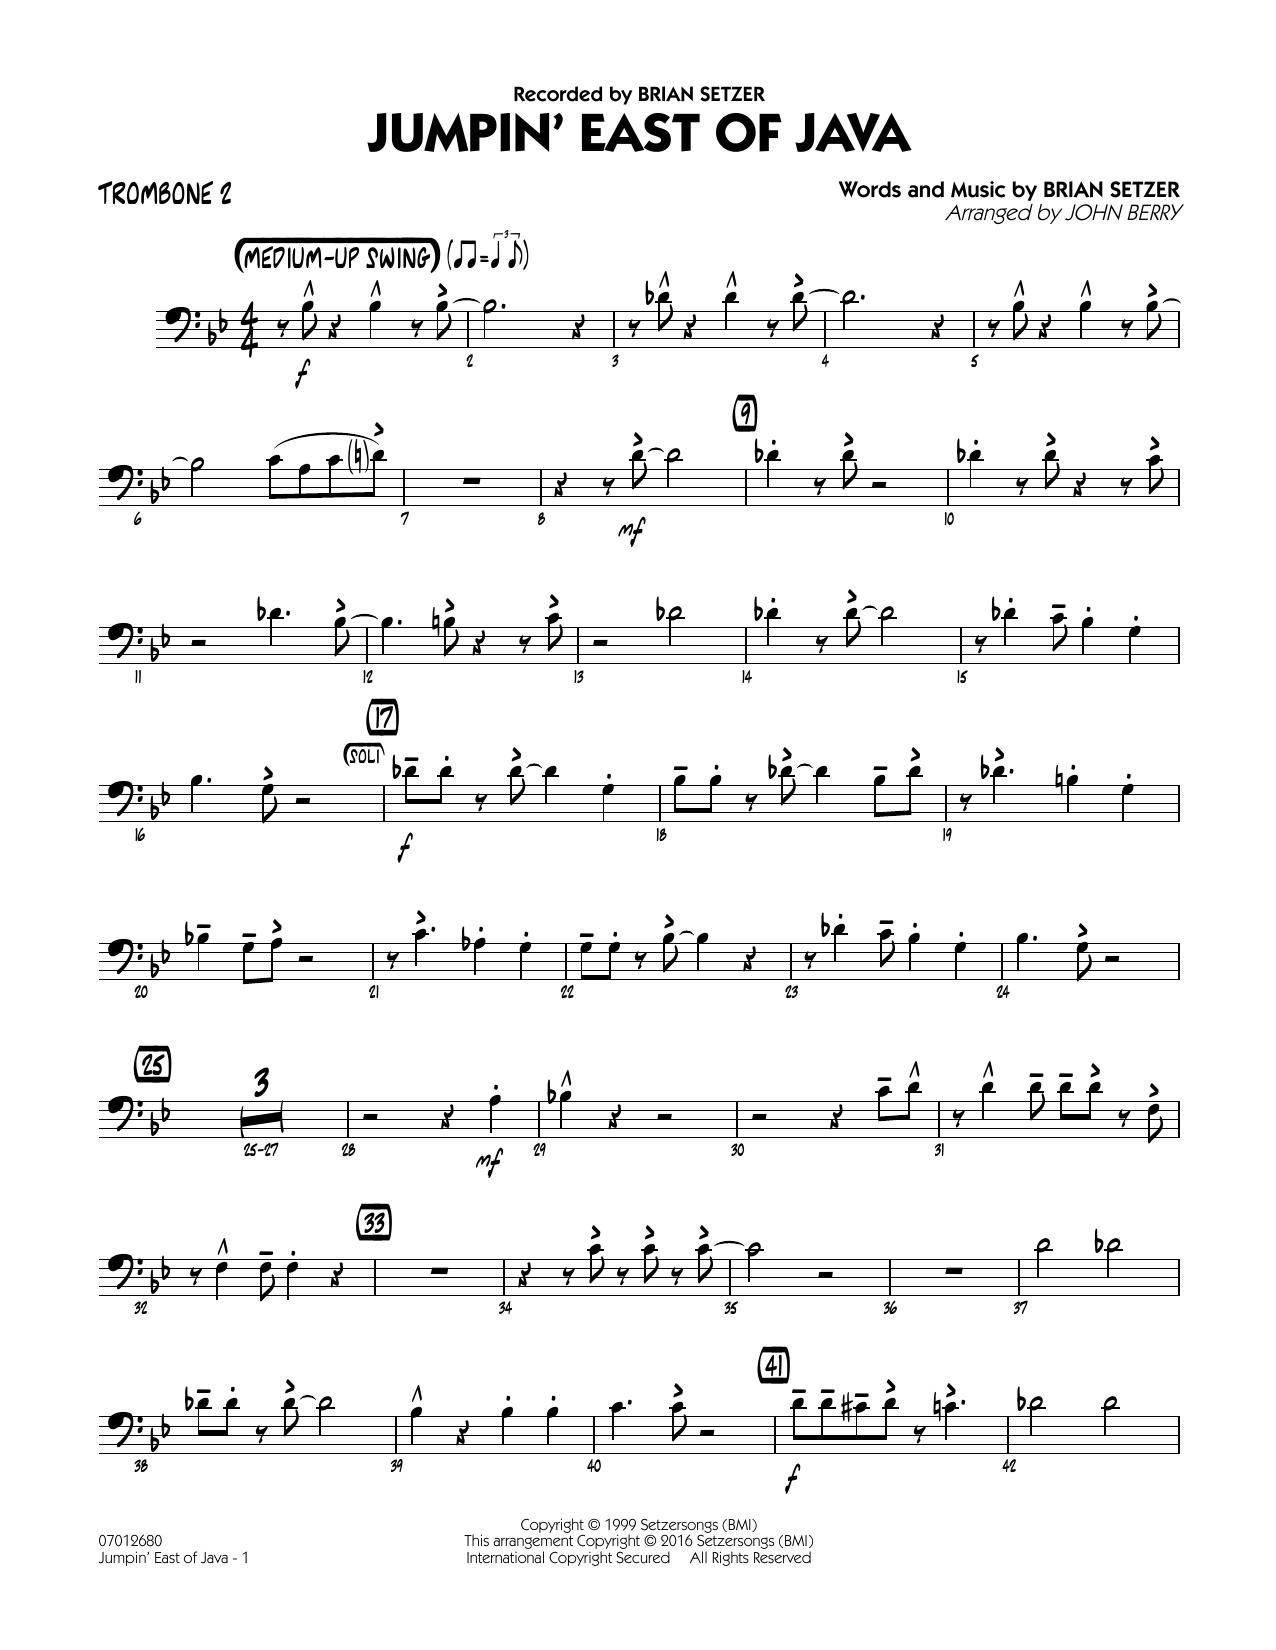 Brian Setzer - Jumpin' East of Java - Trombone 2